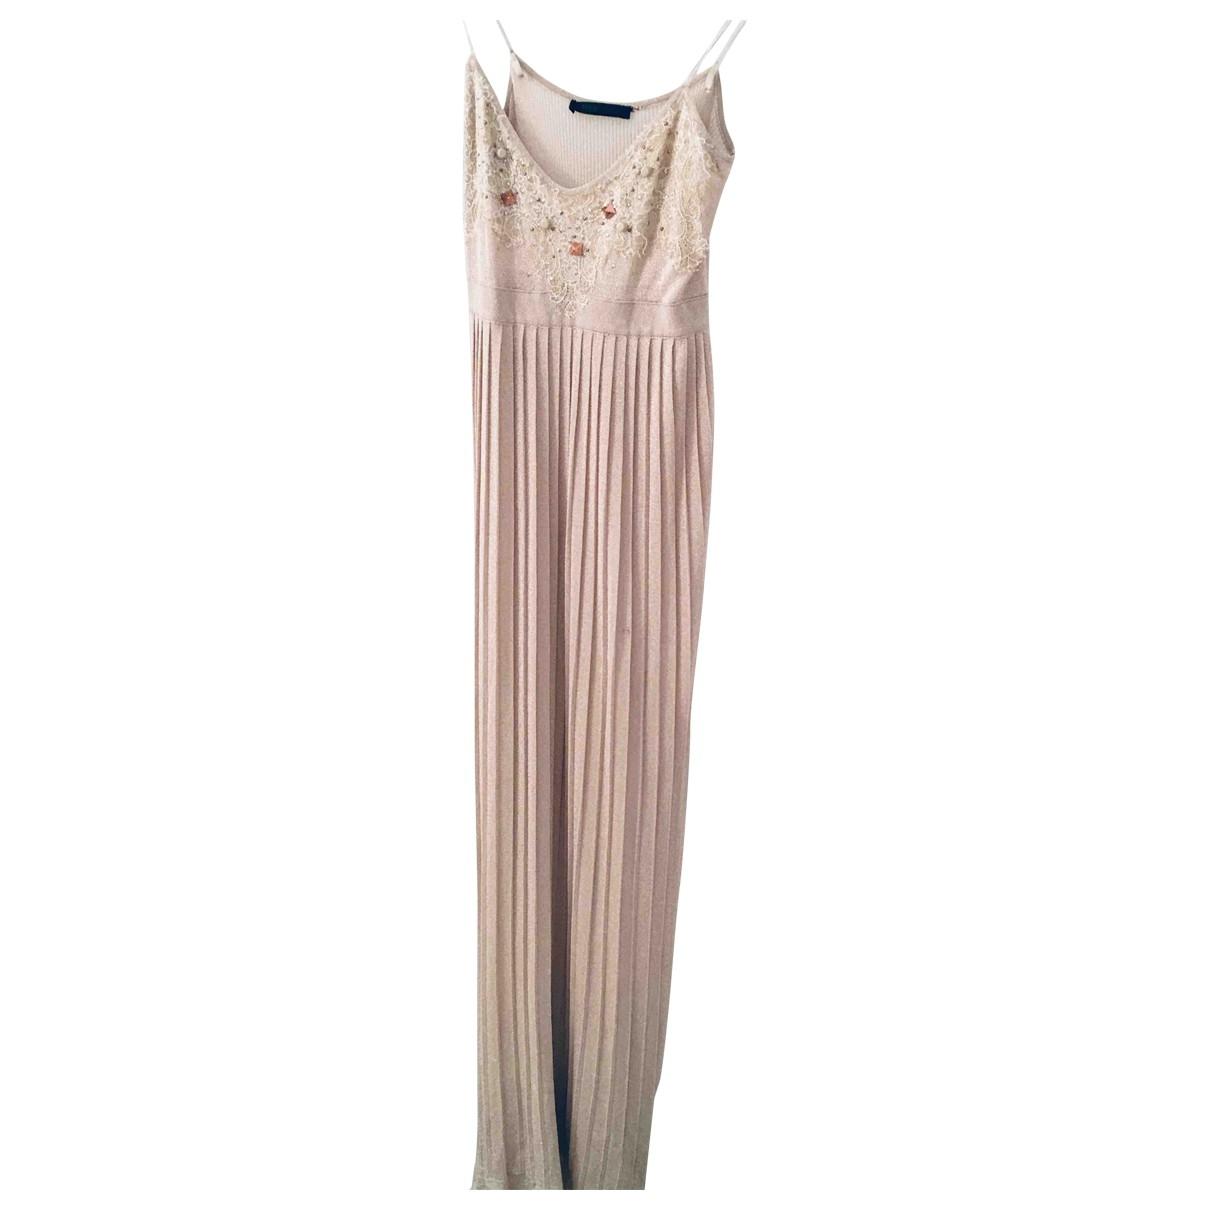 Pinko \N Beige Cotton dress for Women M International